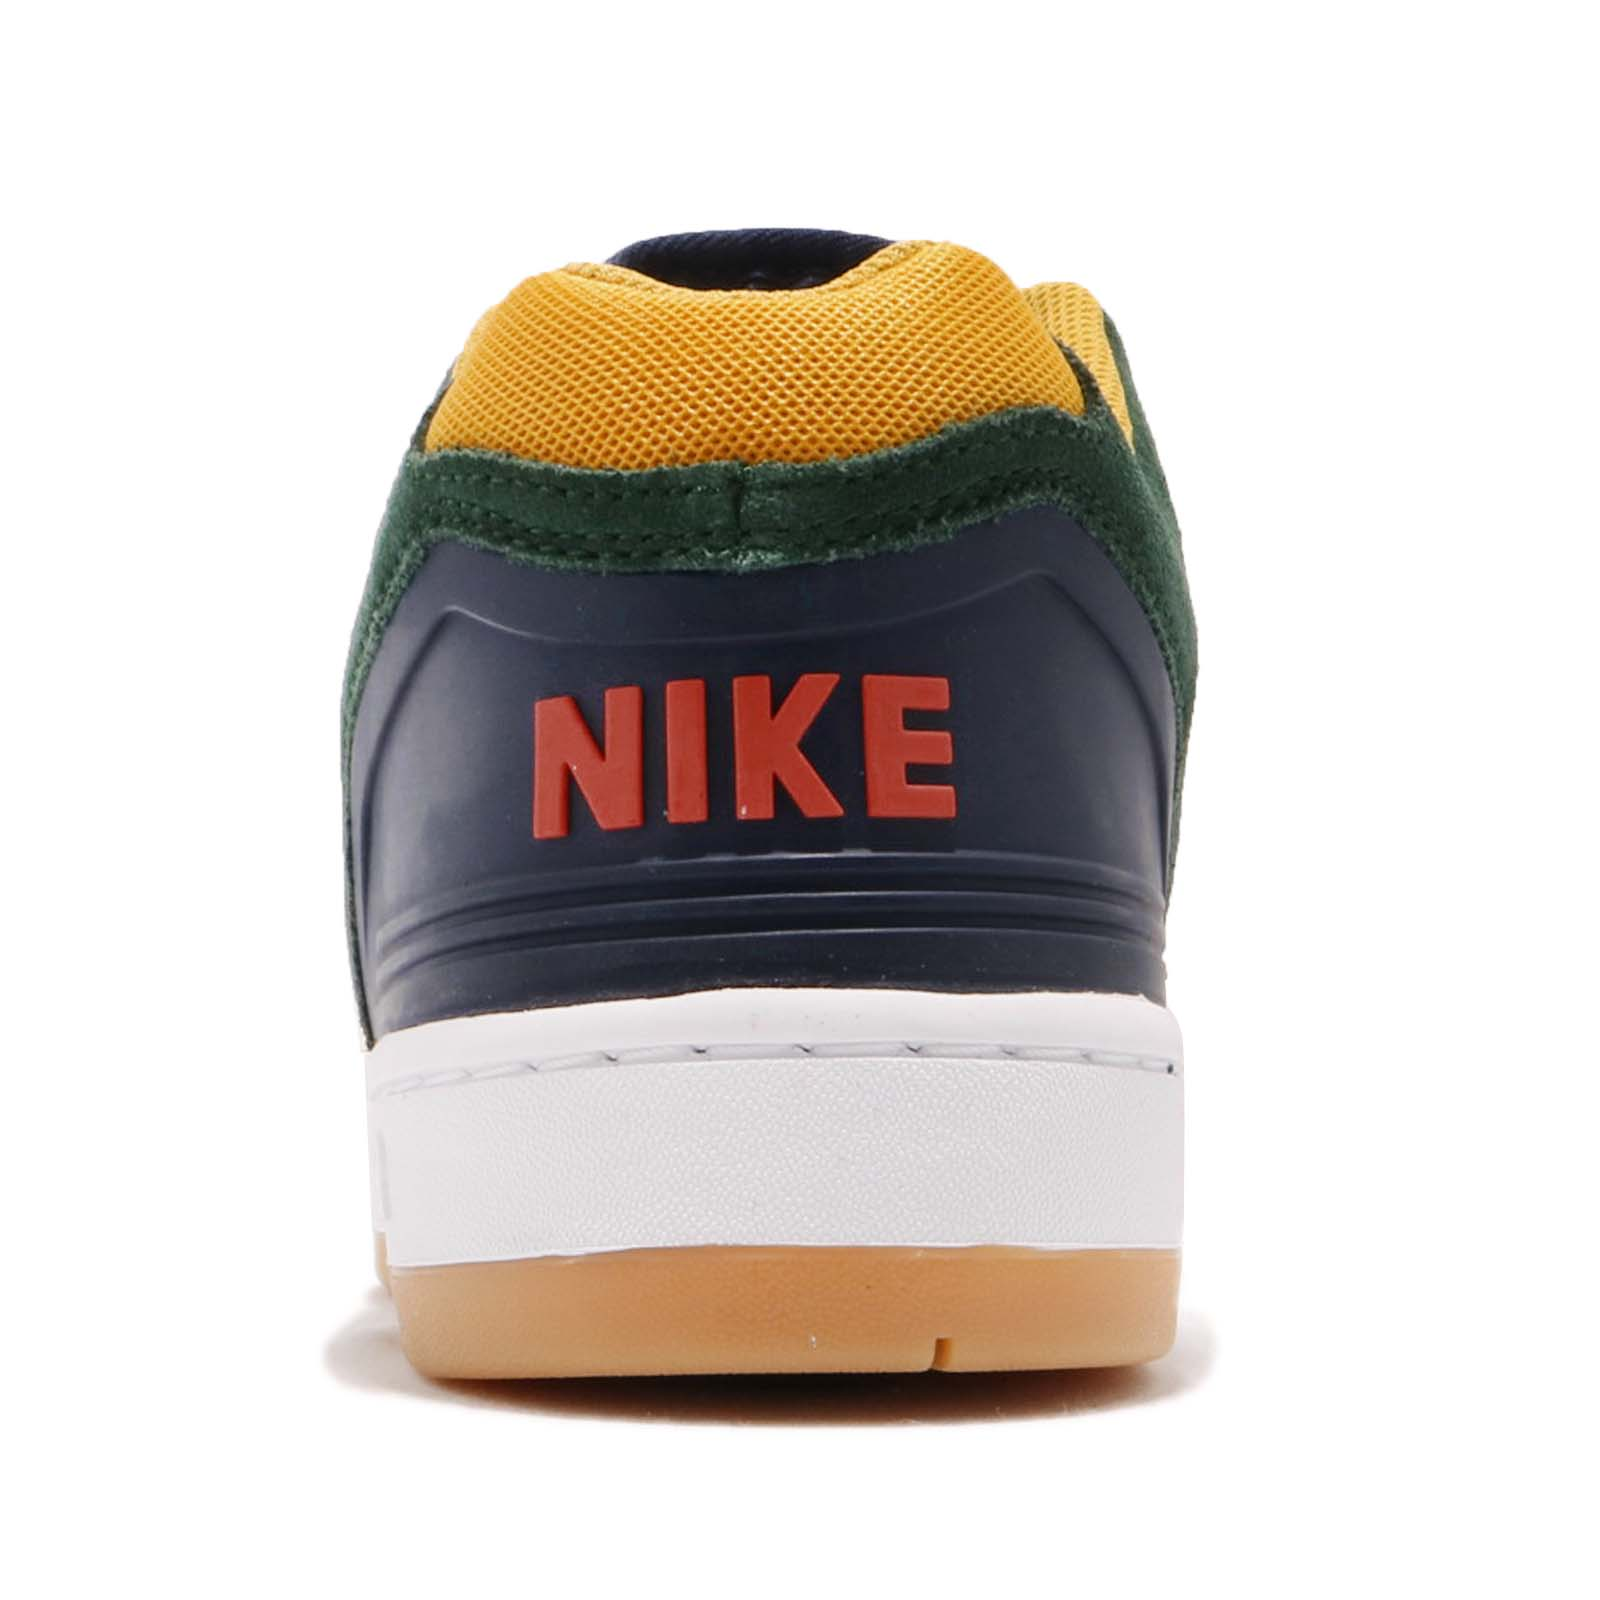 f704e6a4841 Nike SB Air Force II Low 2 Midnight Green Gum Men Skate Boarding ...